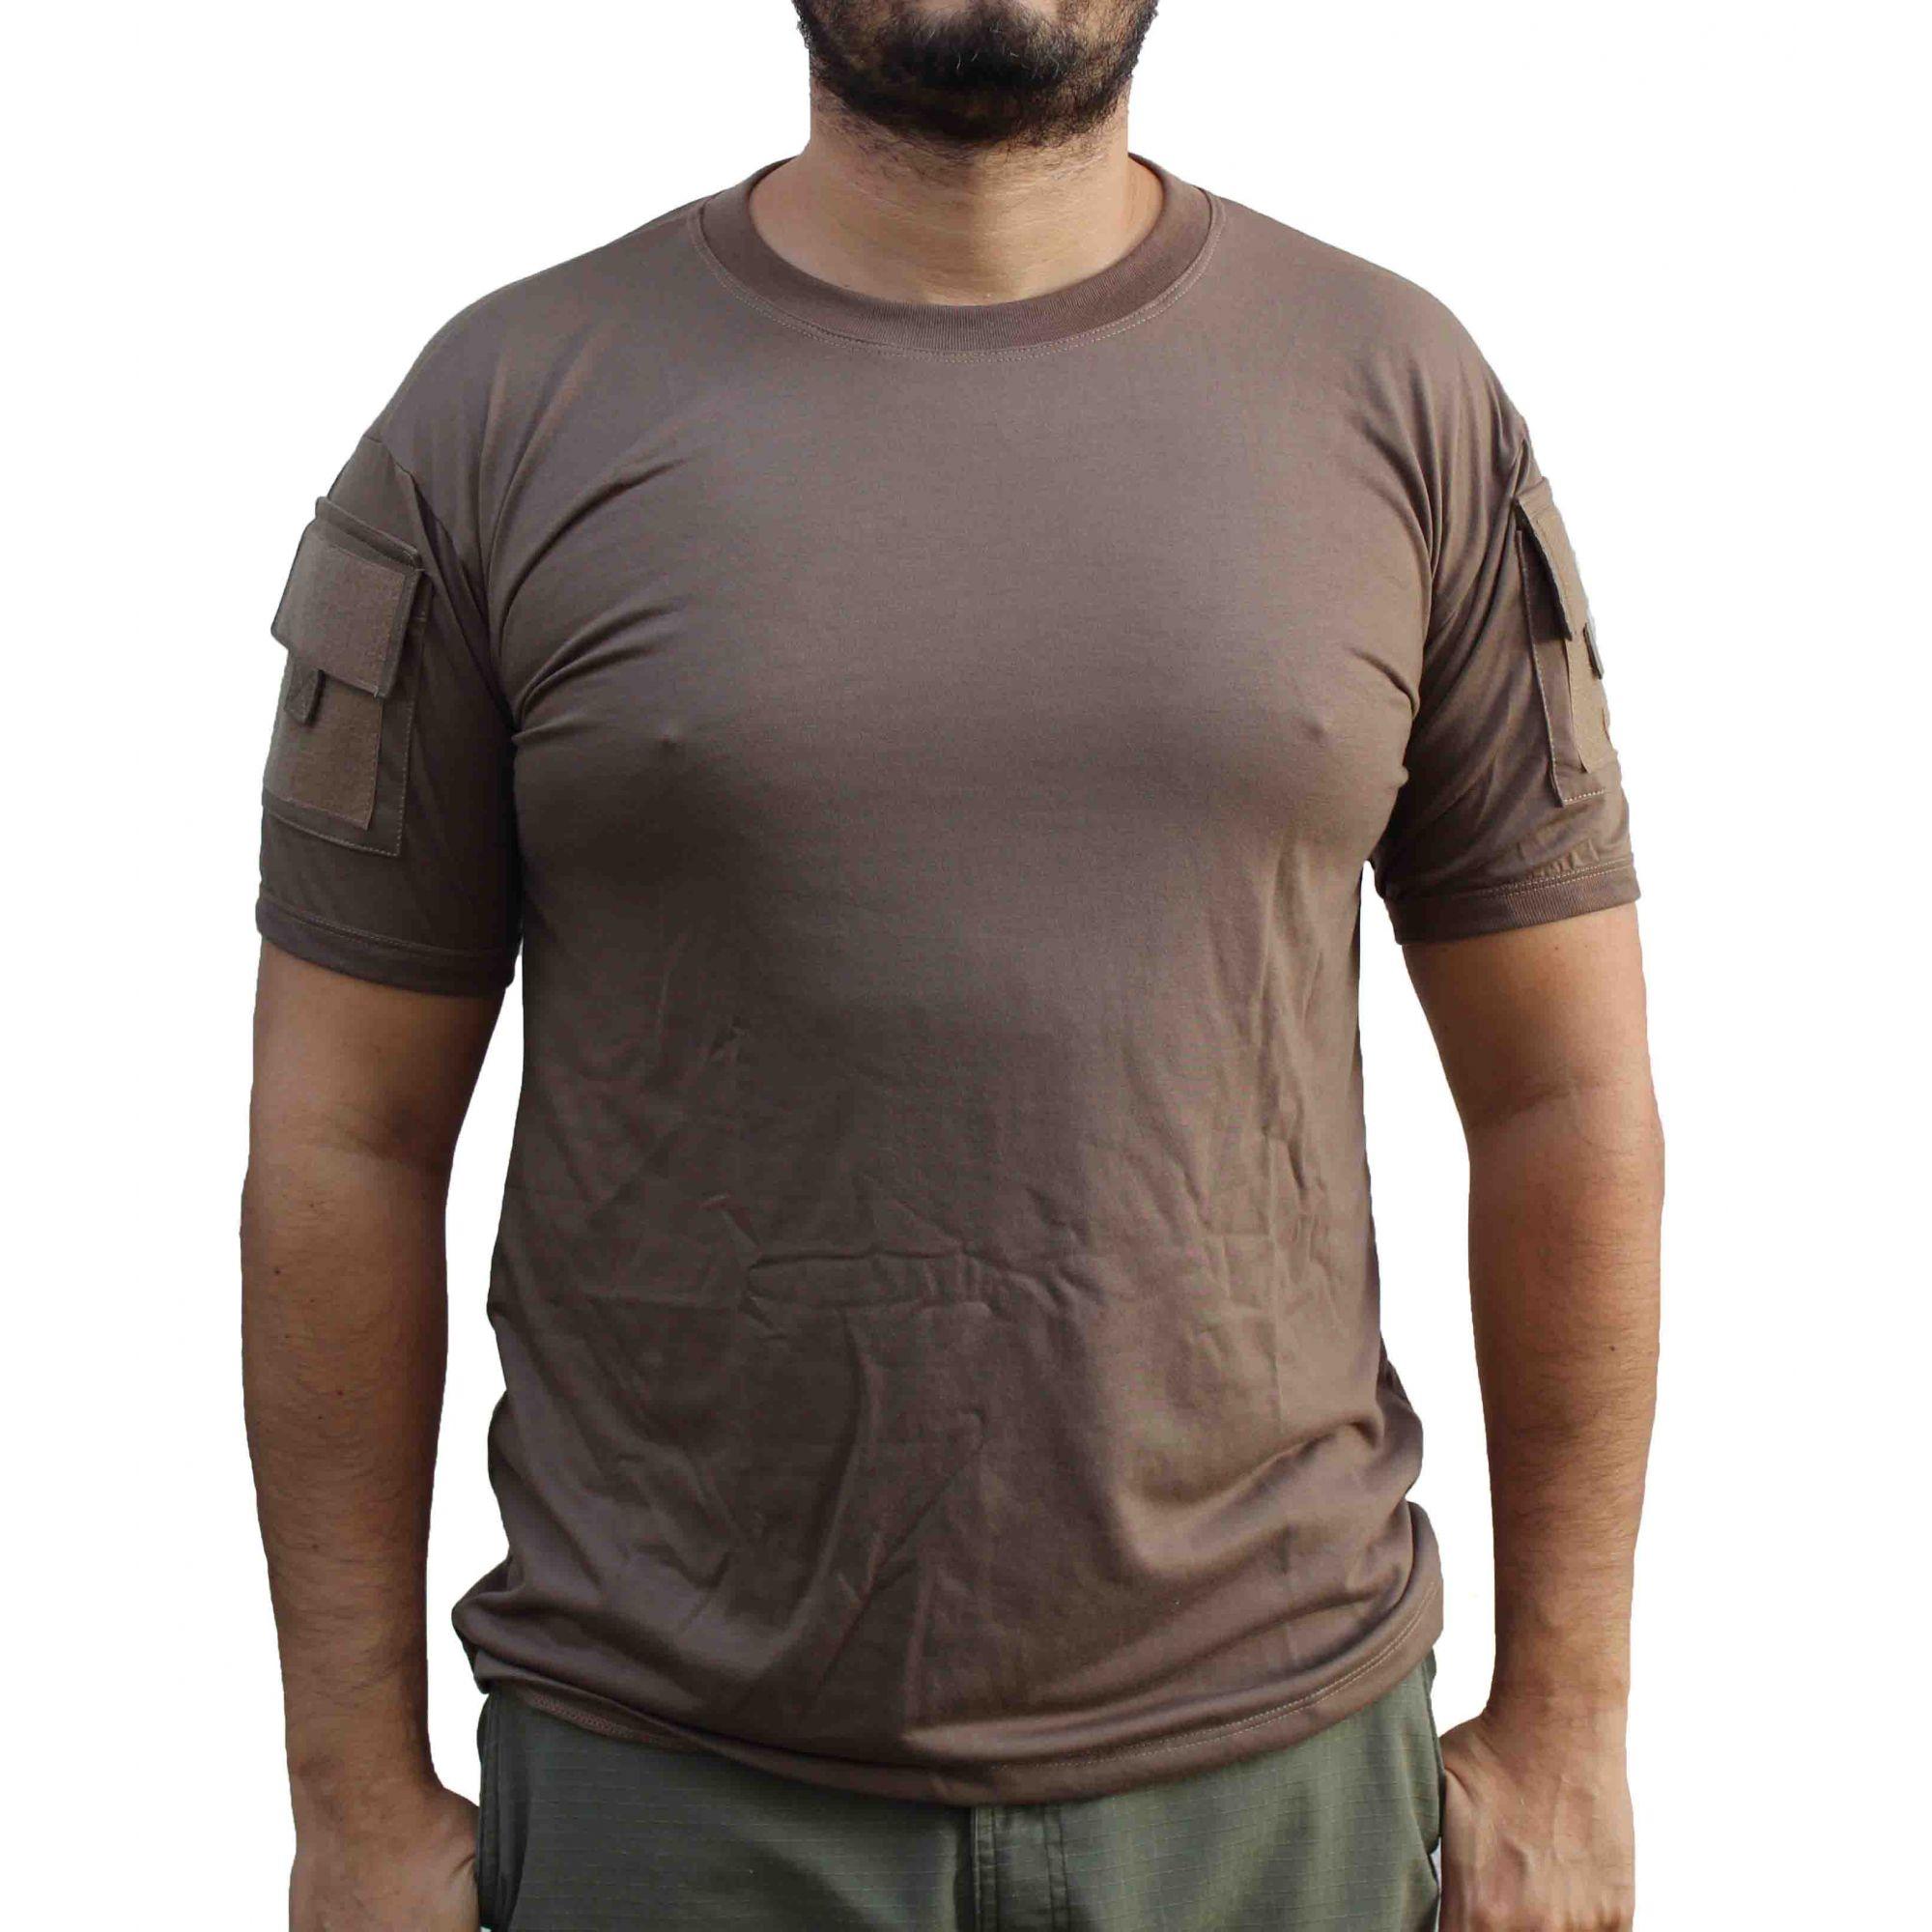 Camisa Tática Marrom/ Chocolate